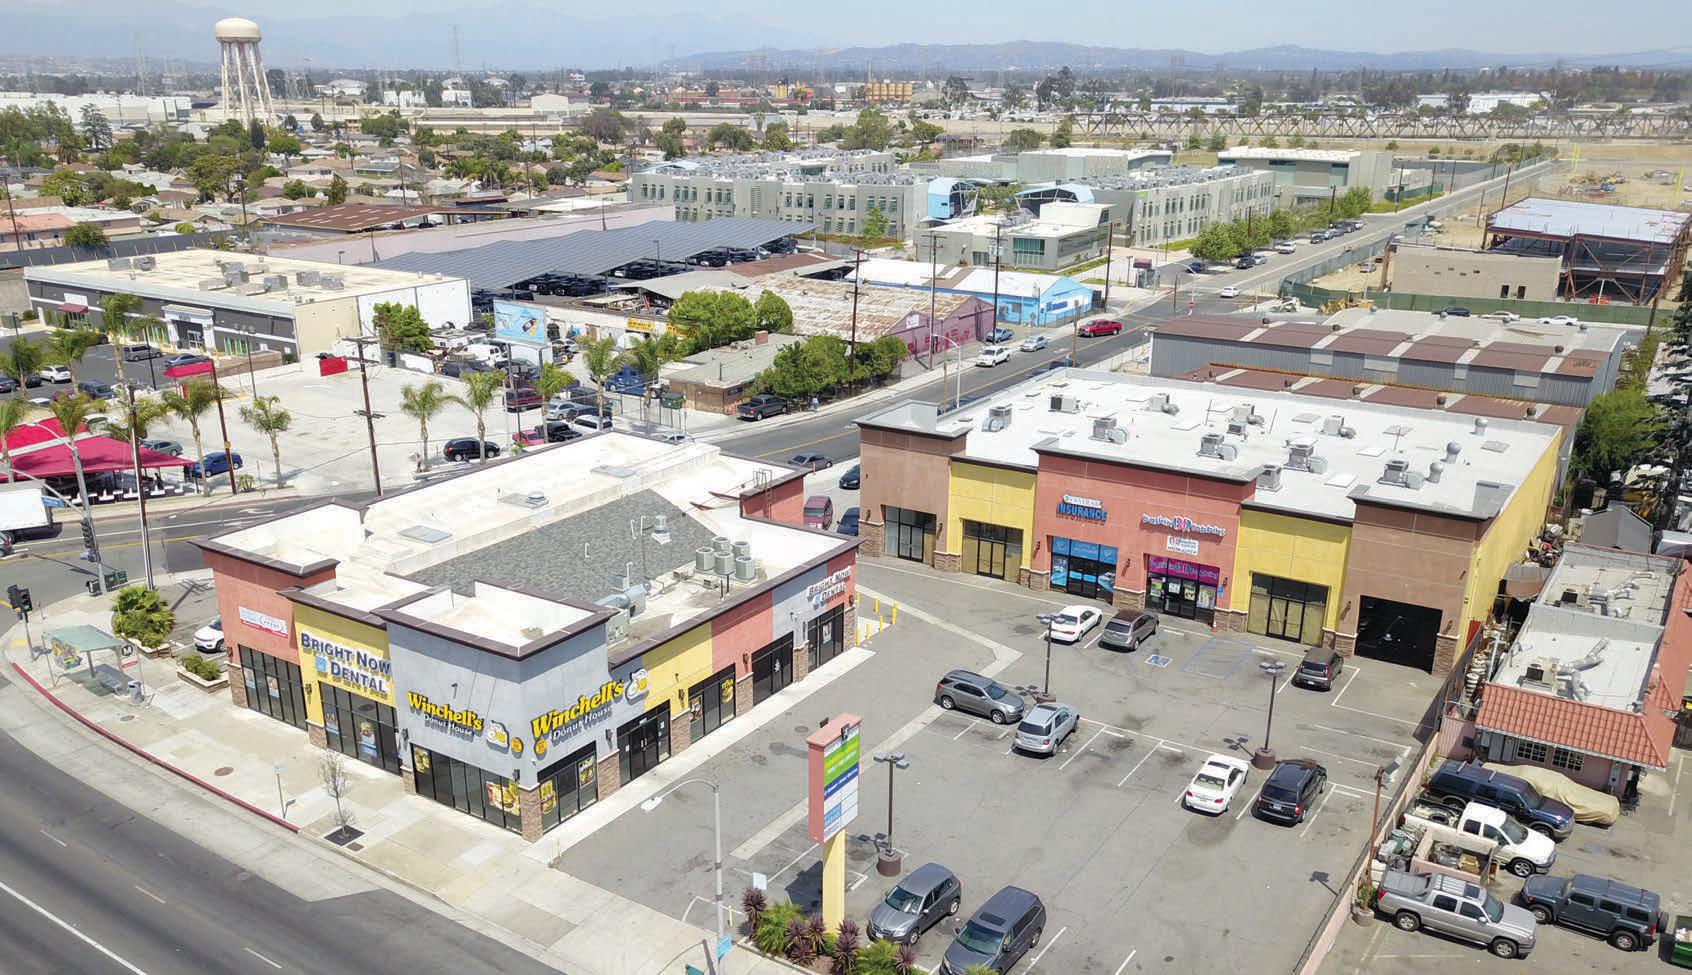 9918-9924 Atlantic / 5120 Tweedy Blvd.   South Gate, CA 90280  20,248 SF BUILDING | 42,790 SF LOT $8,800,000